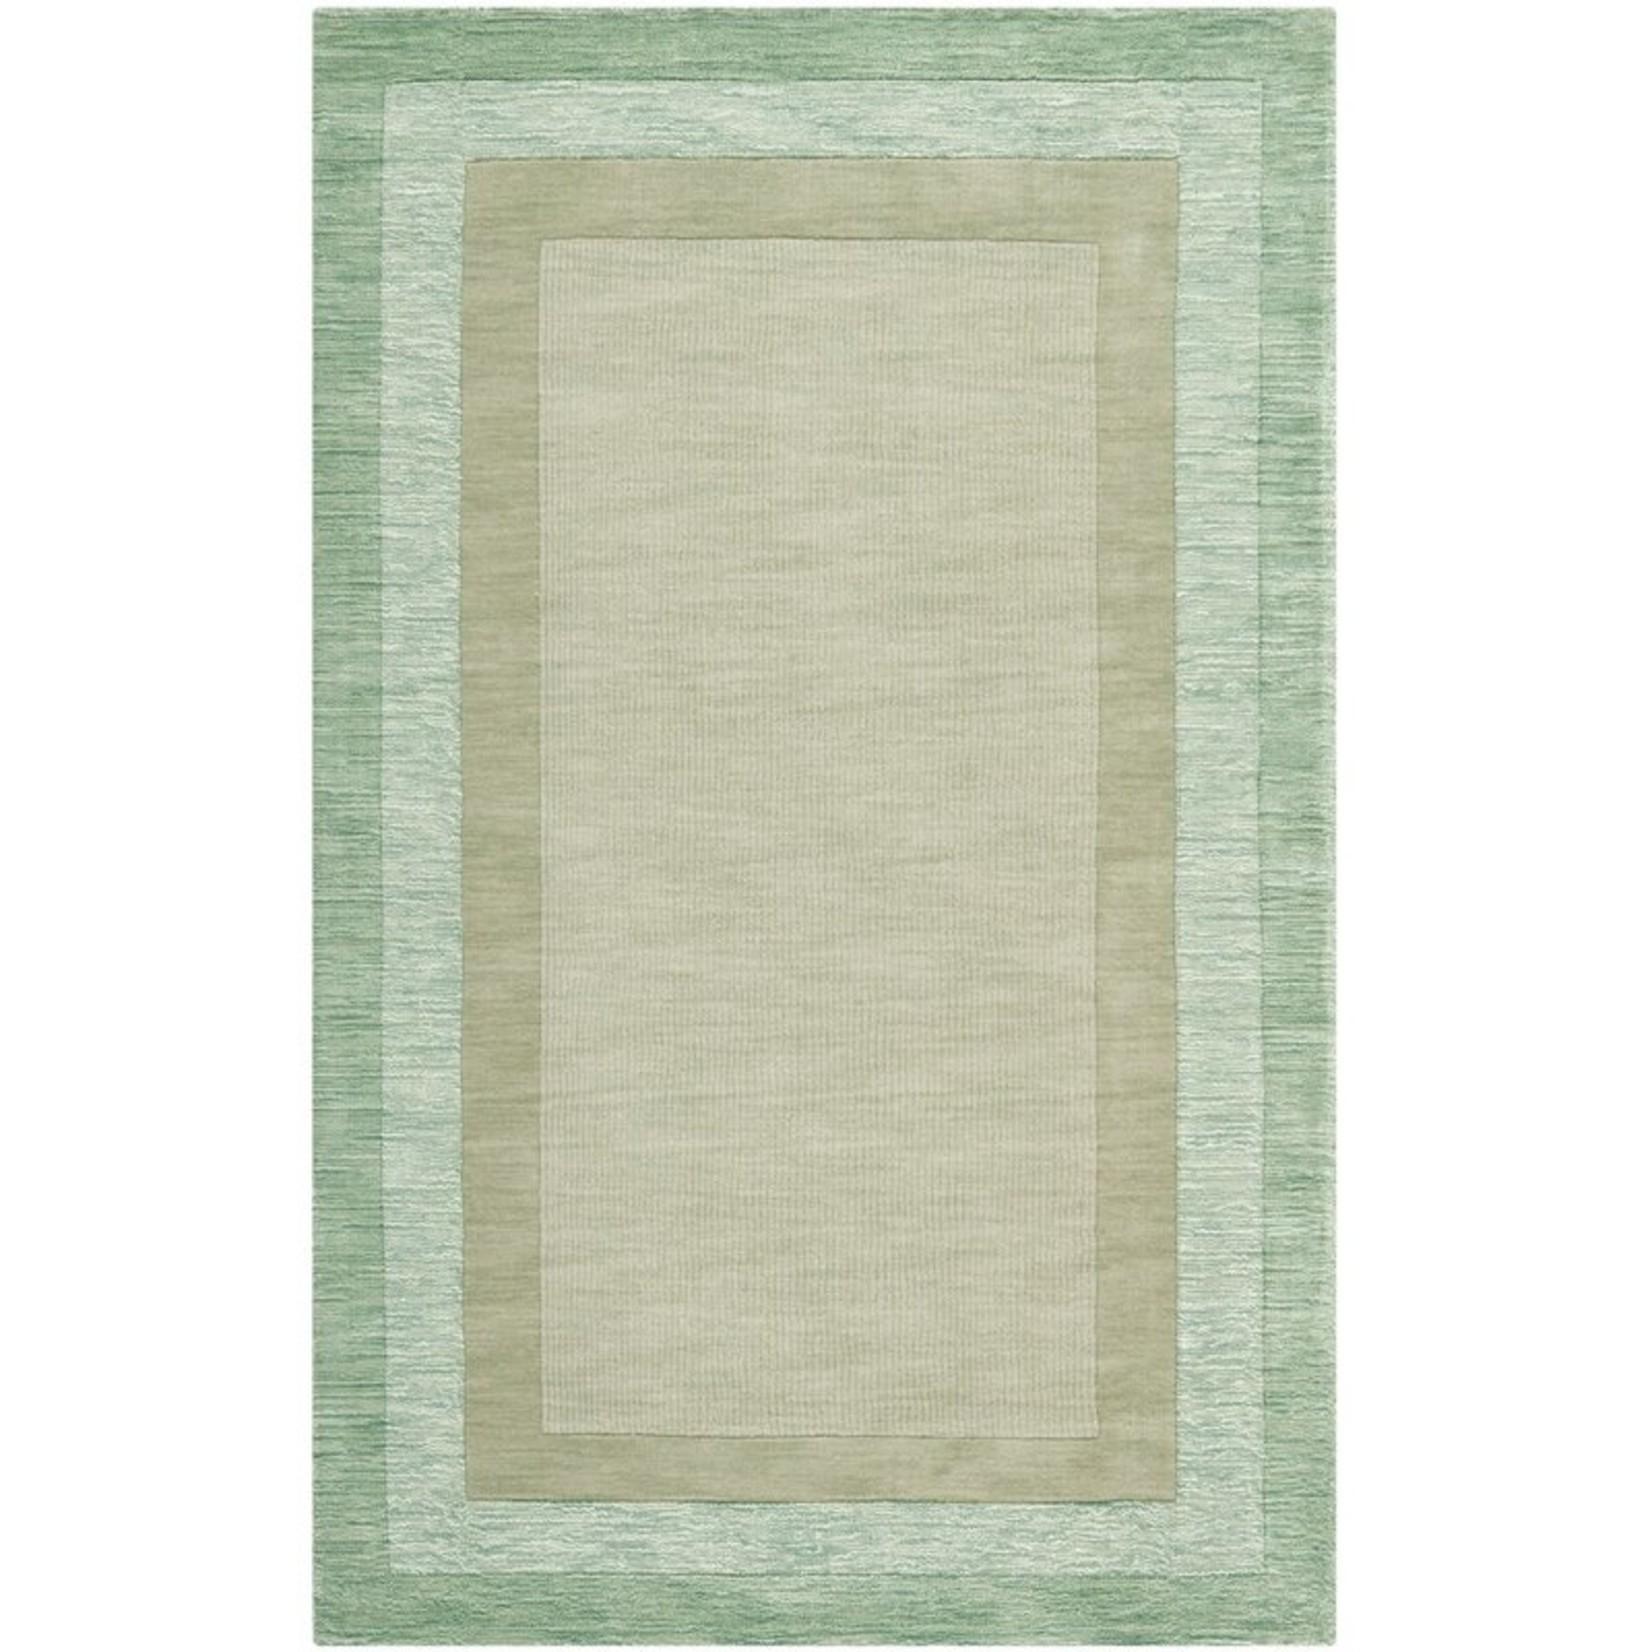 *5' x 8' - Frederica Hand-Hooked Wool Green/Beige Area Rug